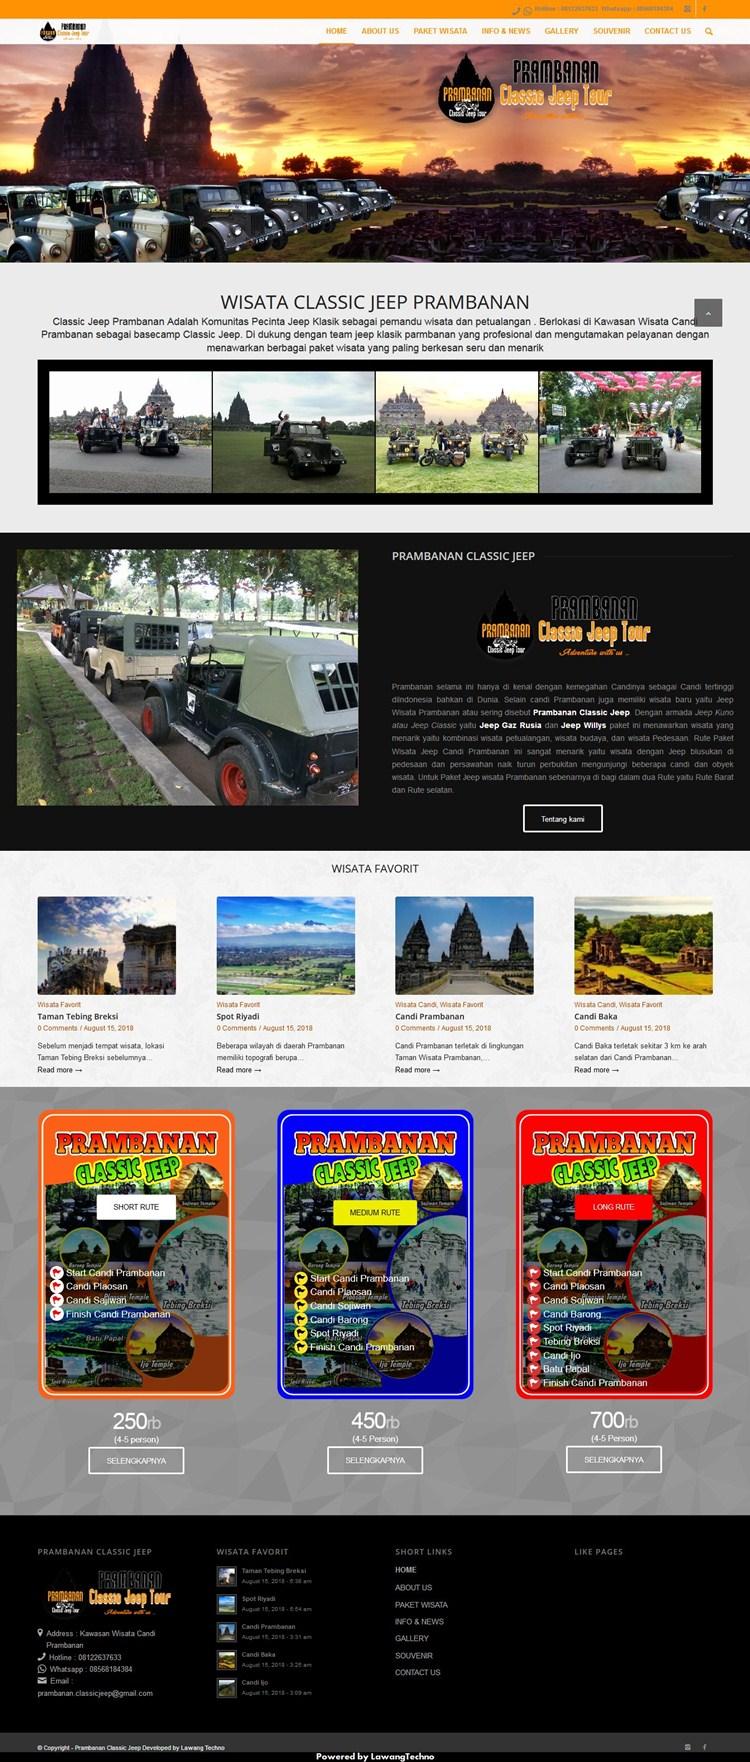 prambanan classic jeep